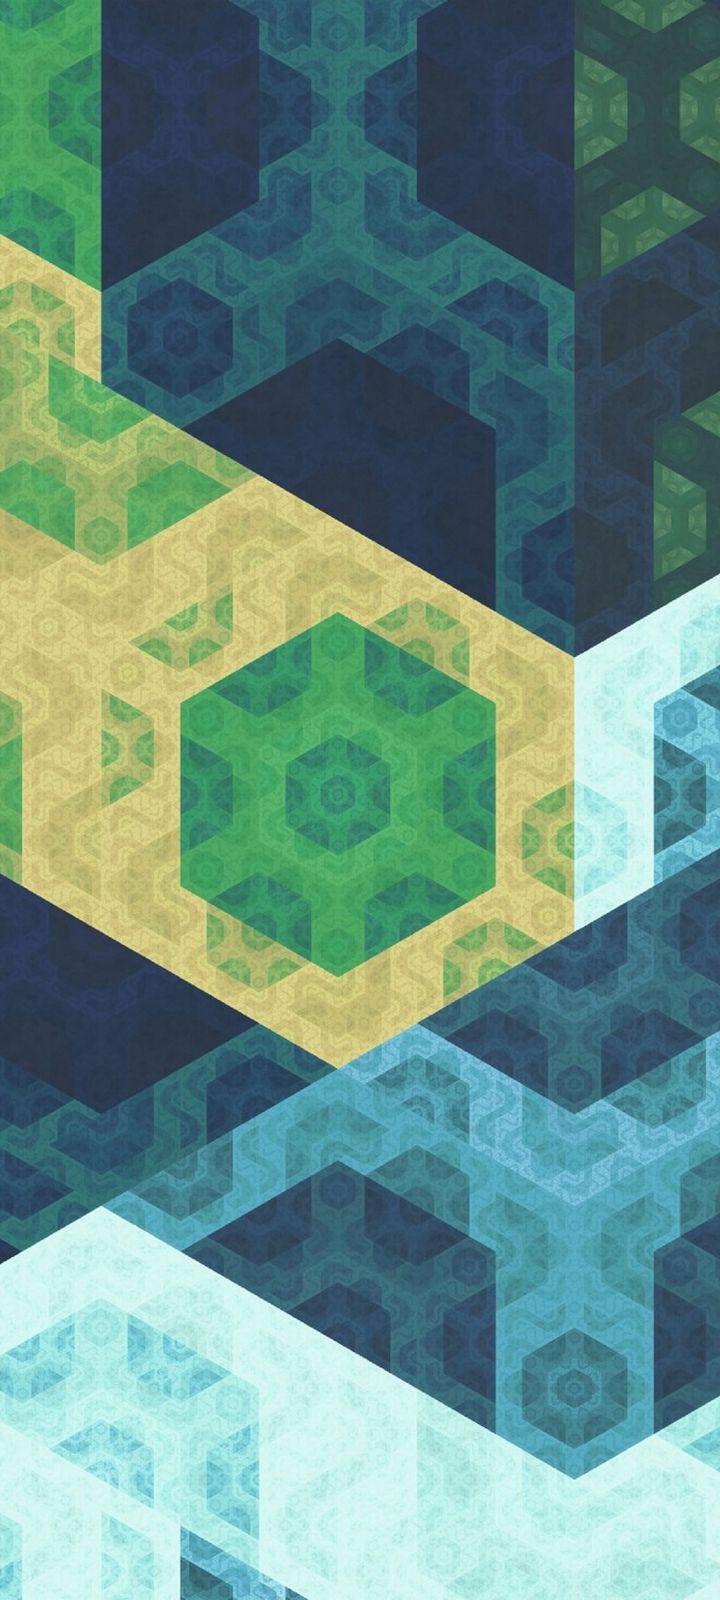 Pattern Geometric Colorful Wallpaper 720x1600